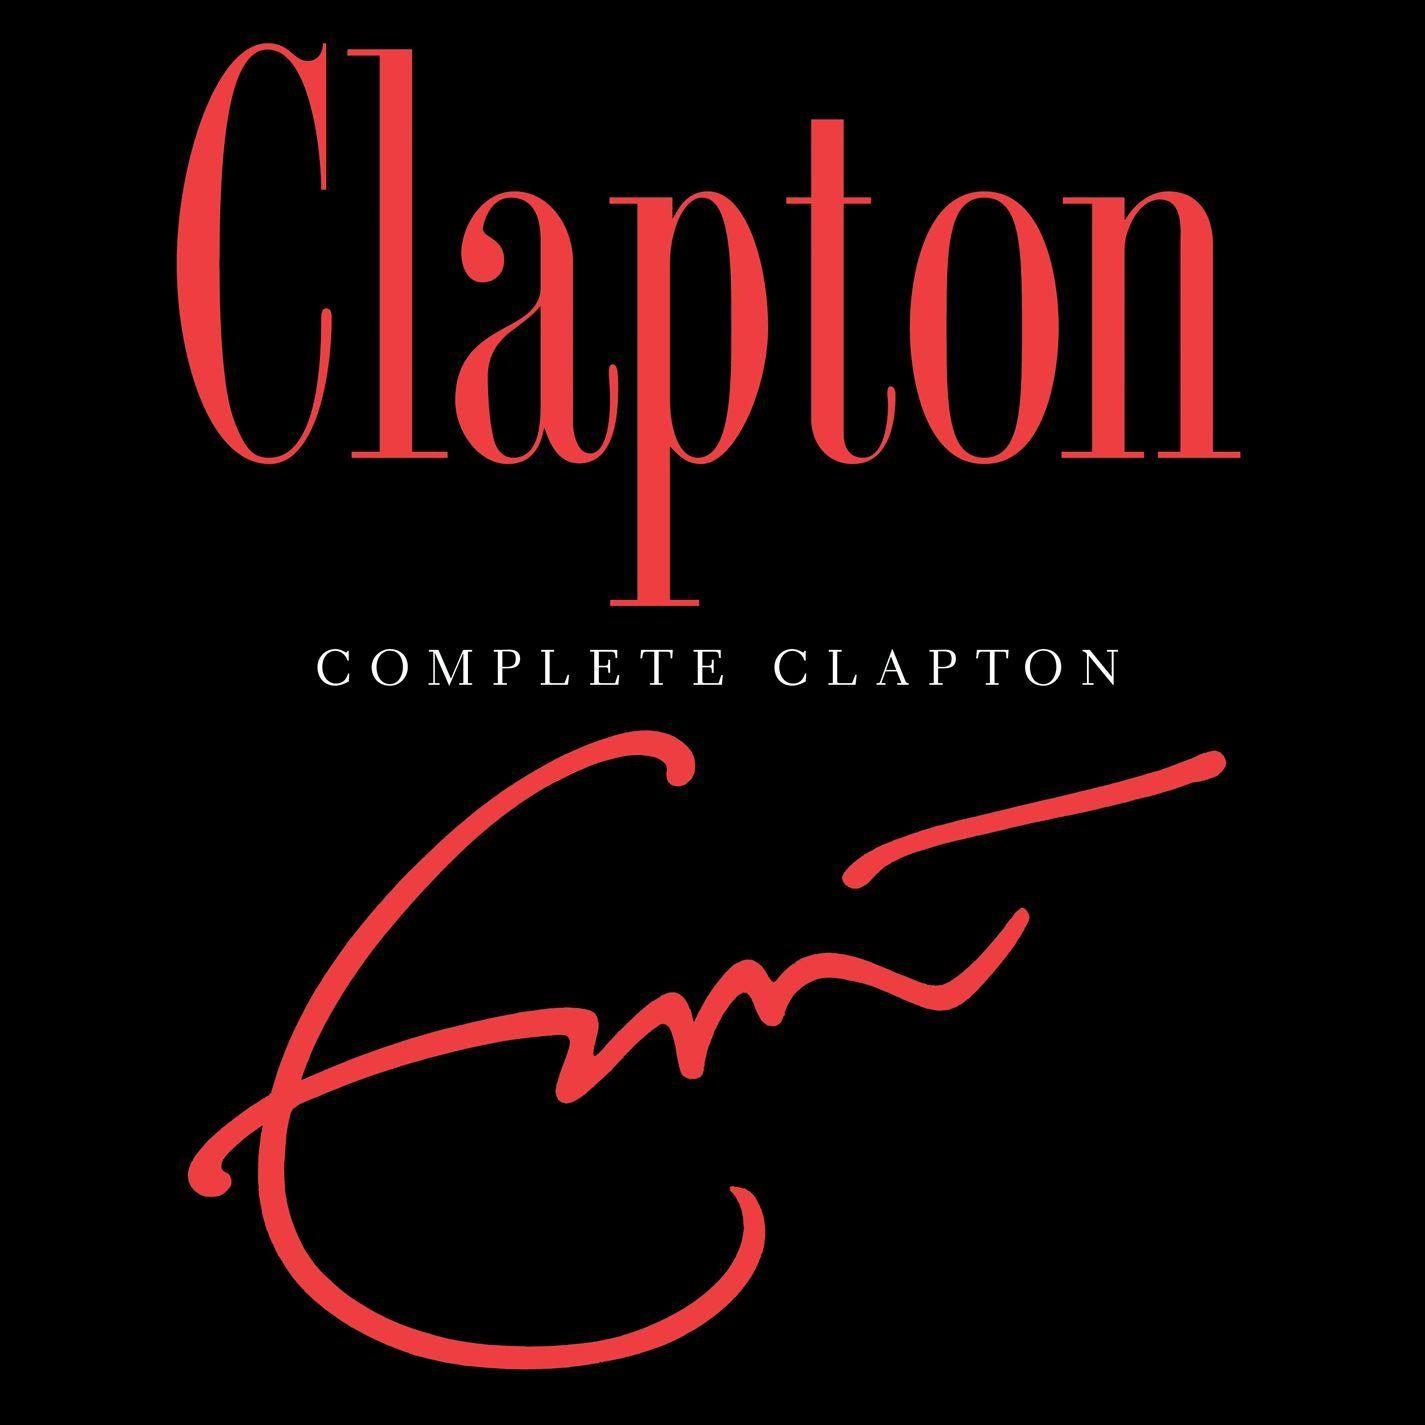 Eric Clapton - Complete Clapton album cover